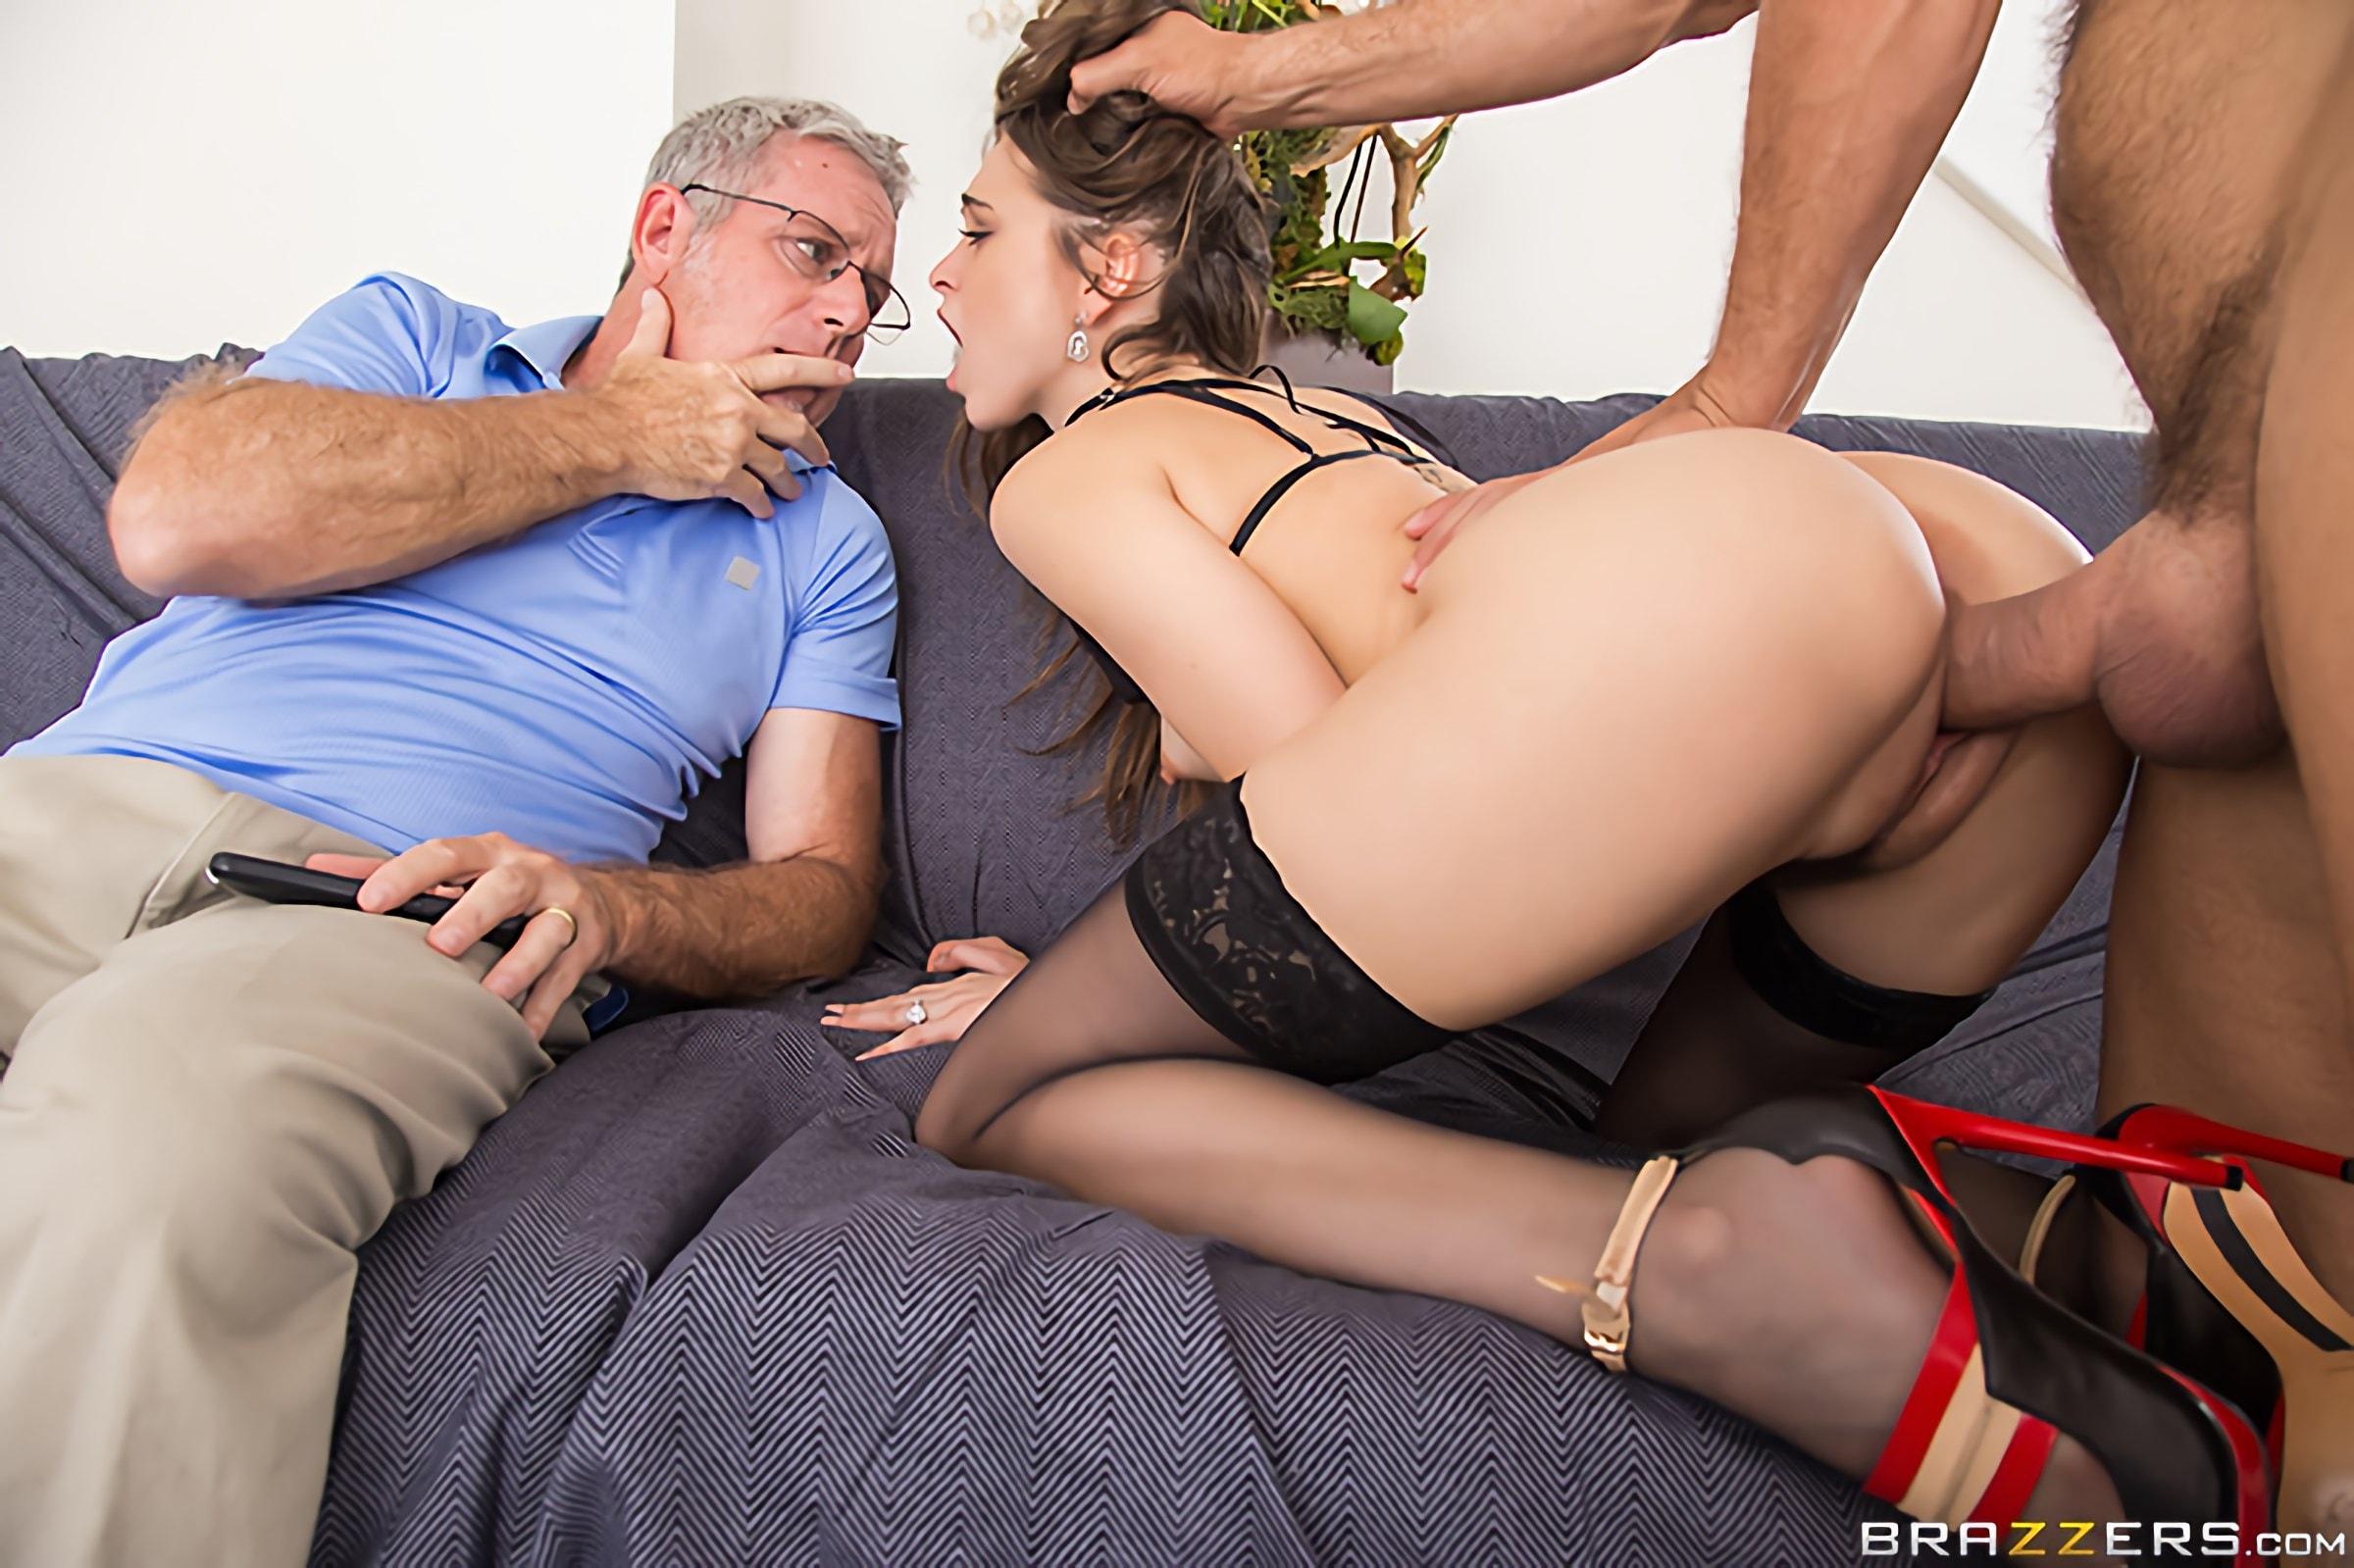 Жена измена порно браззерс 3